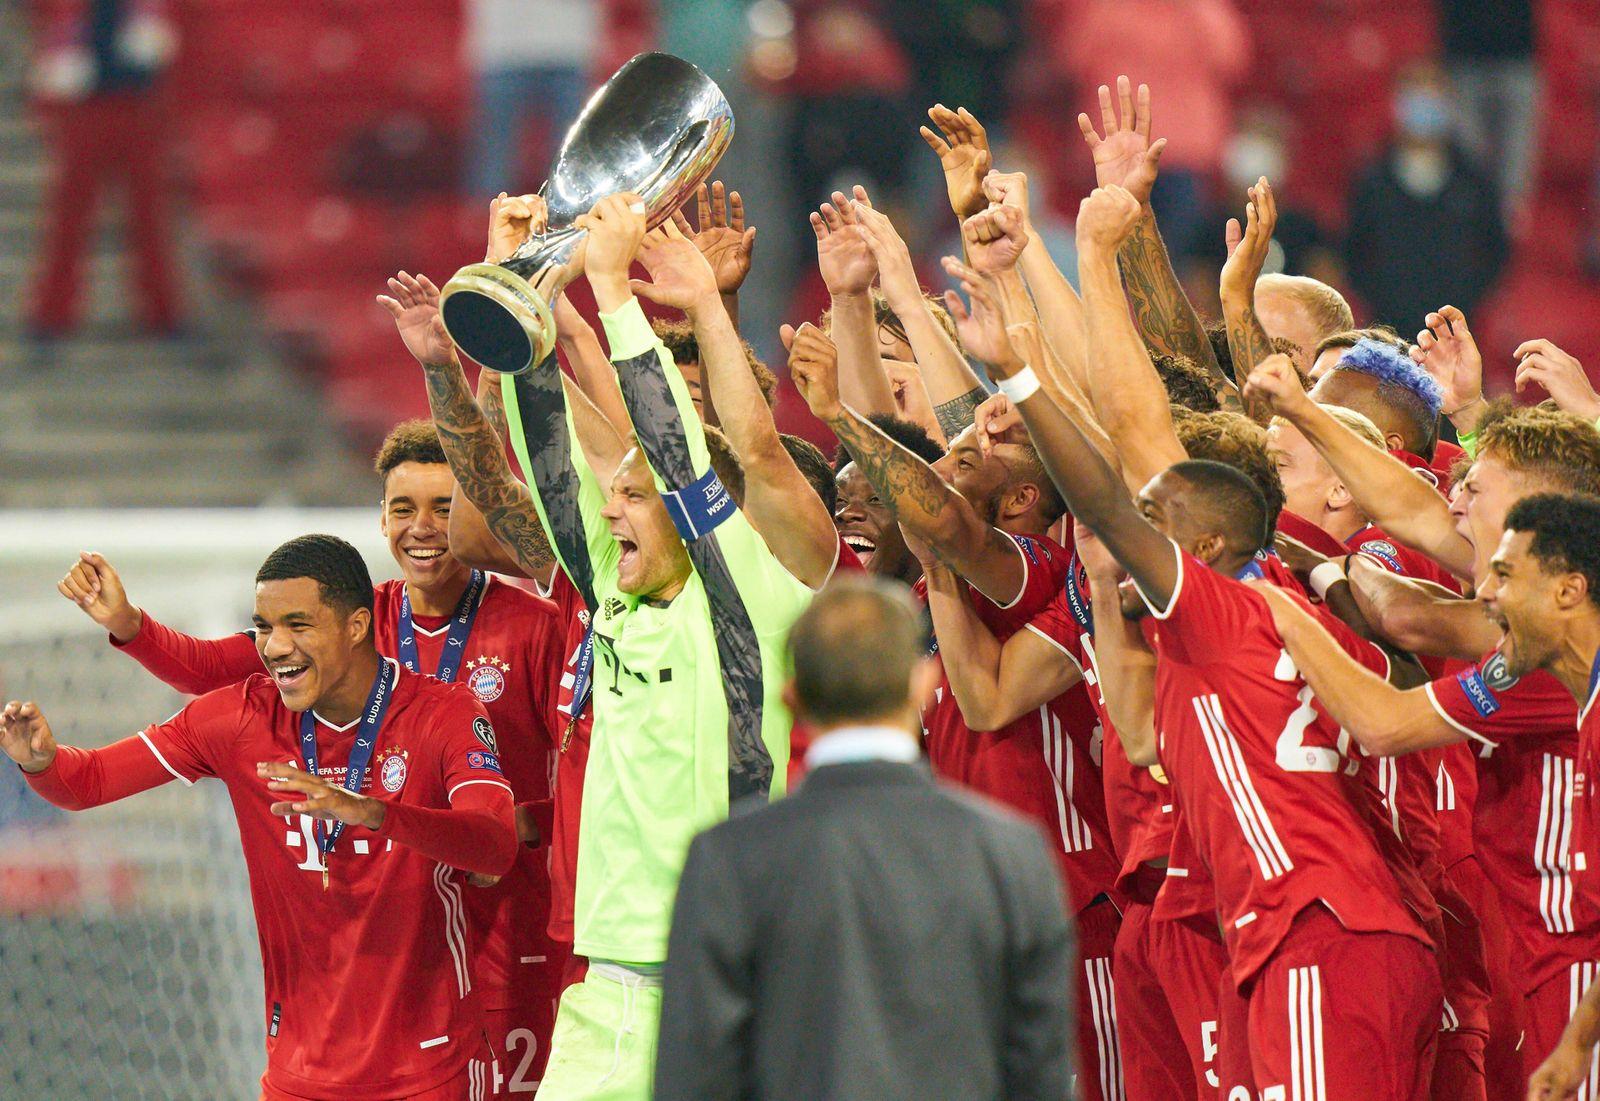 Budapest, Hungary, 24th September 2020. Celebration with trophy Manuel NEUER, goalkeeper FCB 1 Robert LEWANDOWSKI, FCB 9